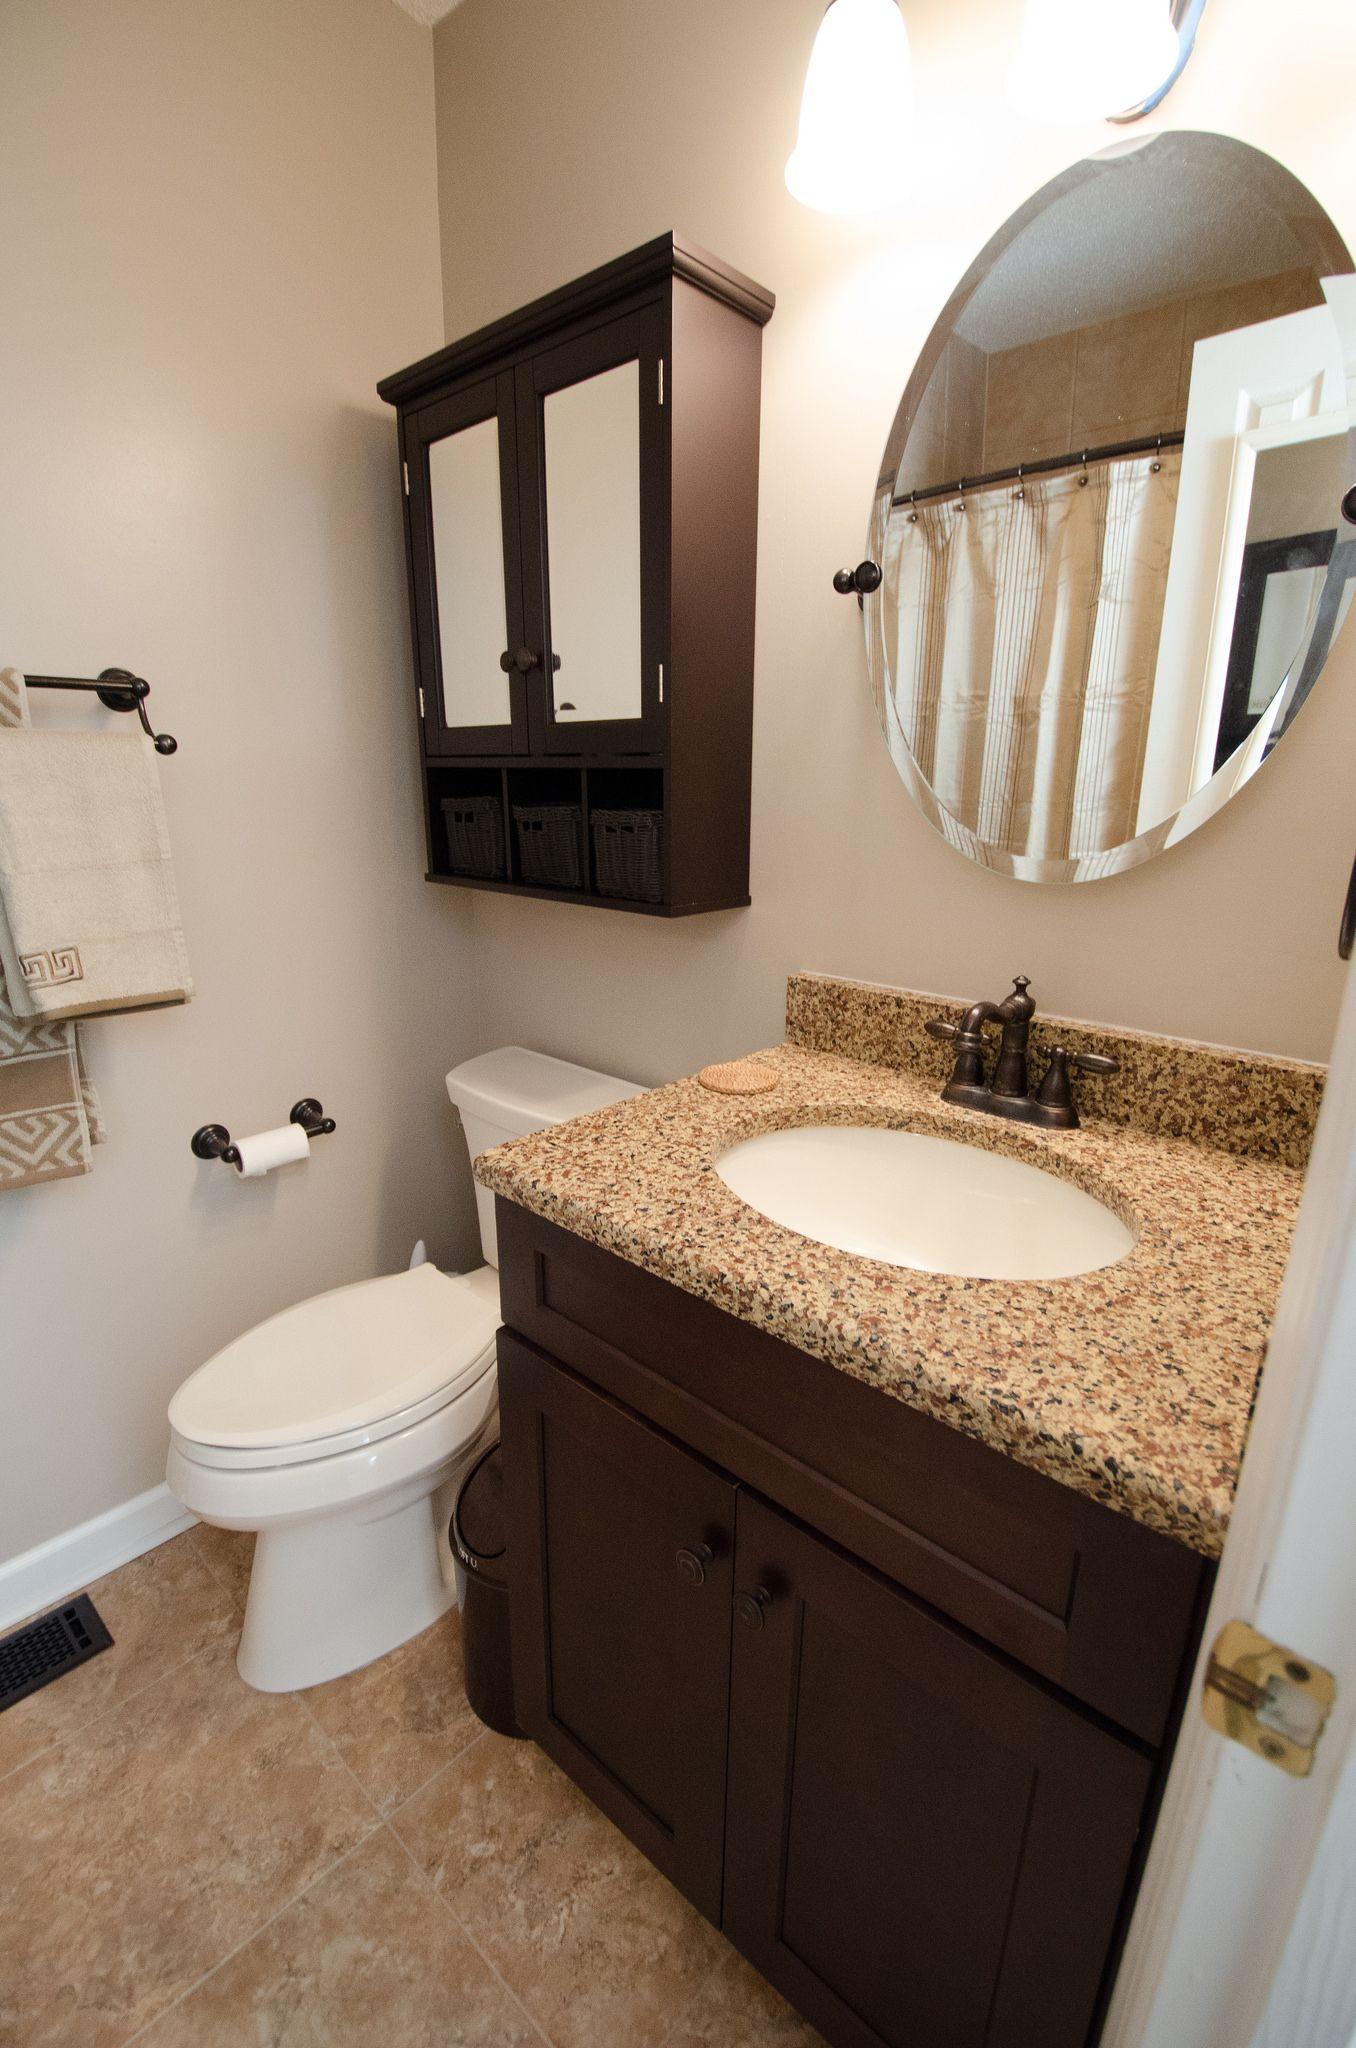 Beau Small Vanity With Medicine Cabinet, Granite Countertop, Oval Mirror,  Complete Bathroom Remodel